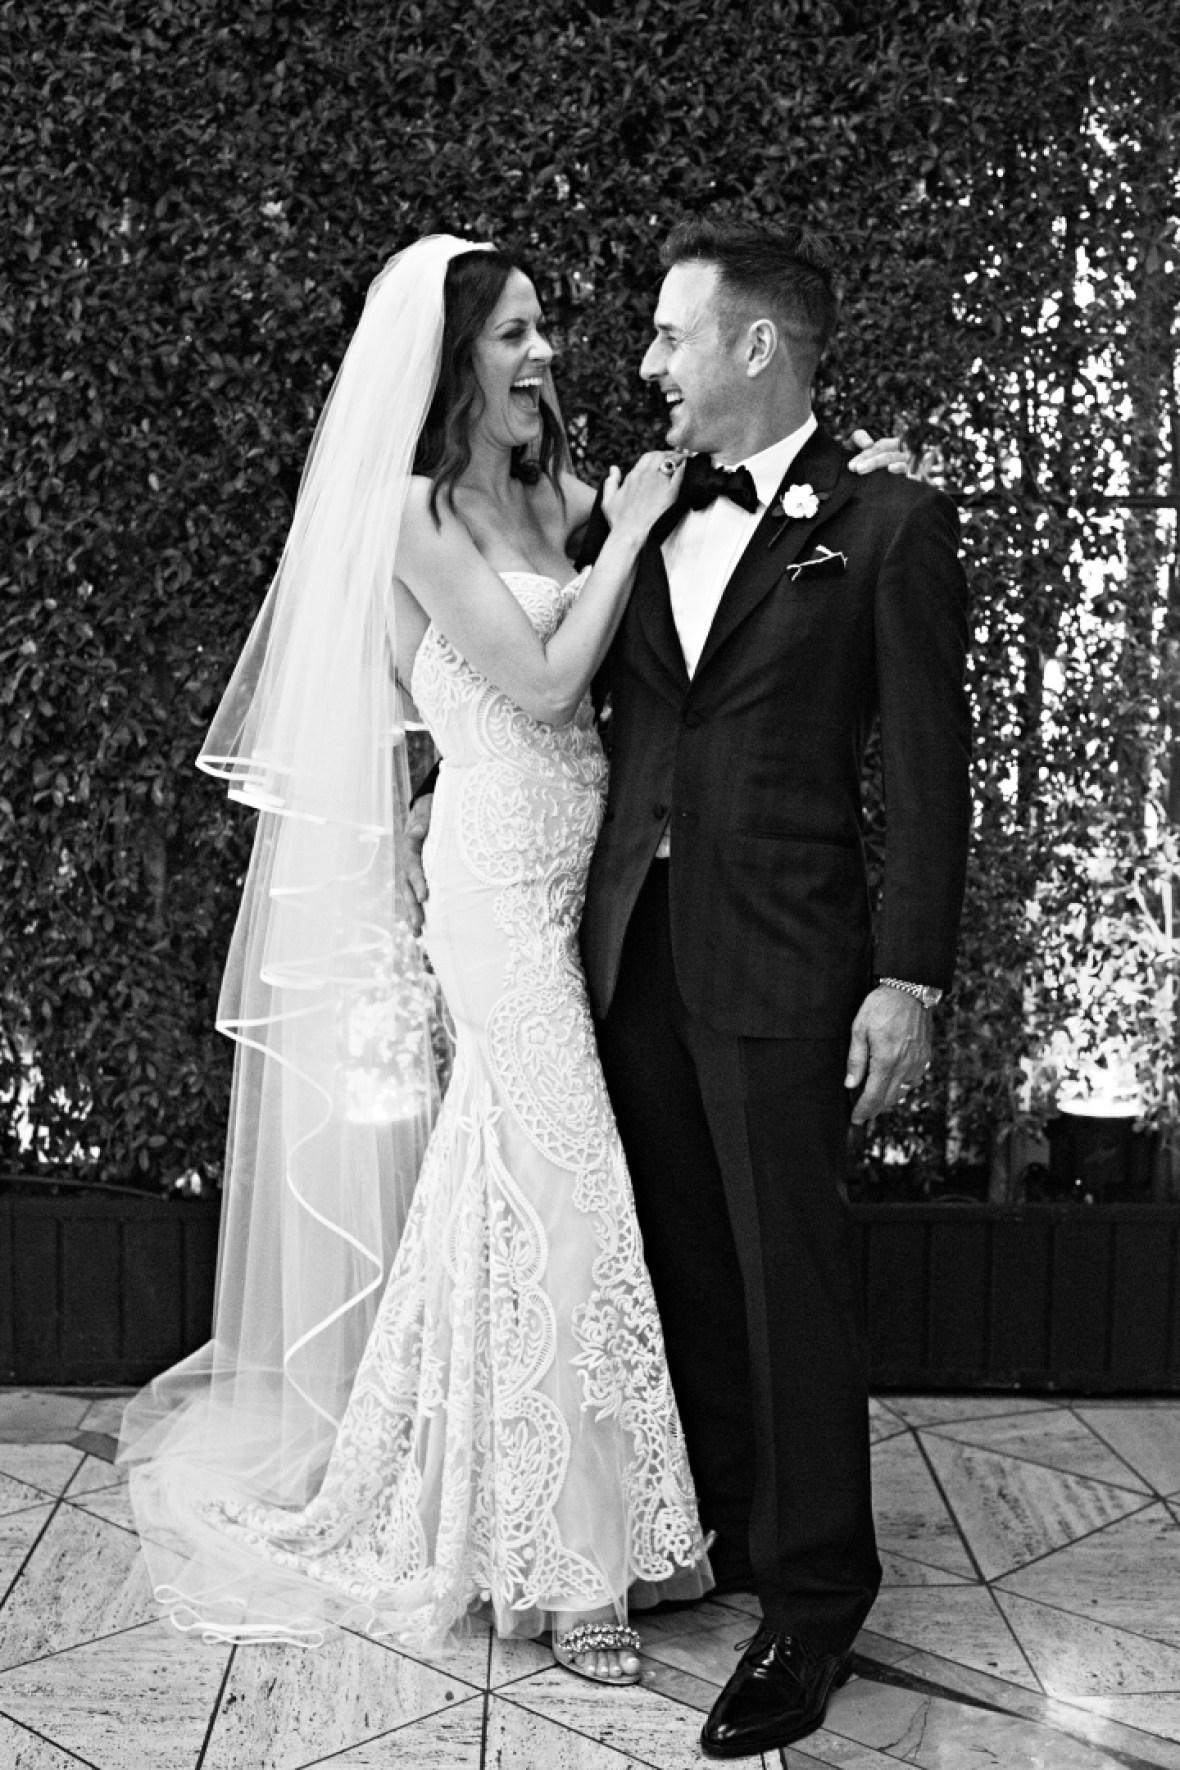 david arquette and christina mclarty wedding